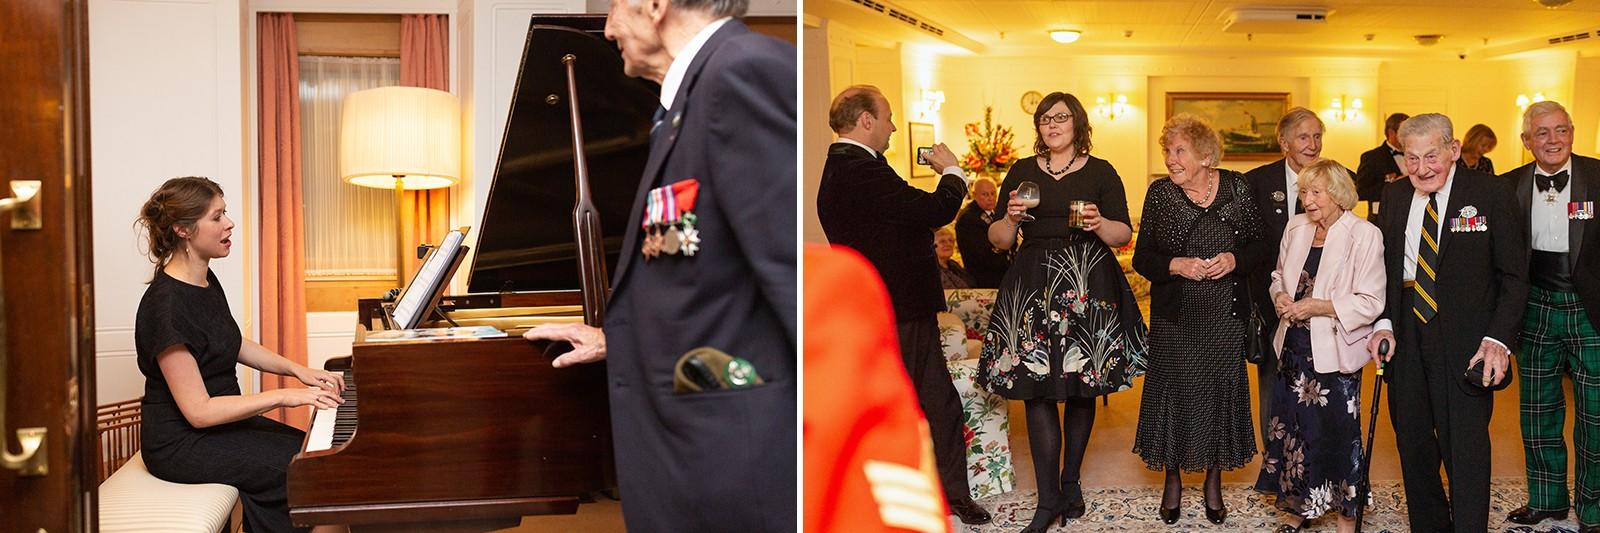 Veterans Christmas Reunion Royal Yacht Britannia